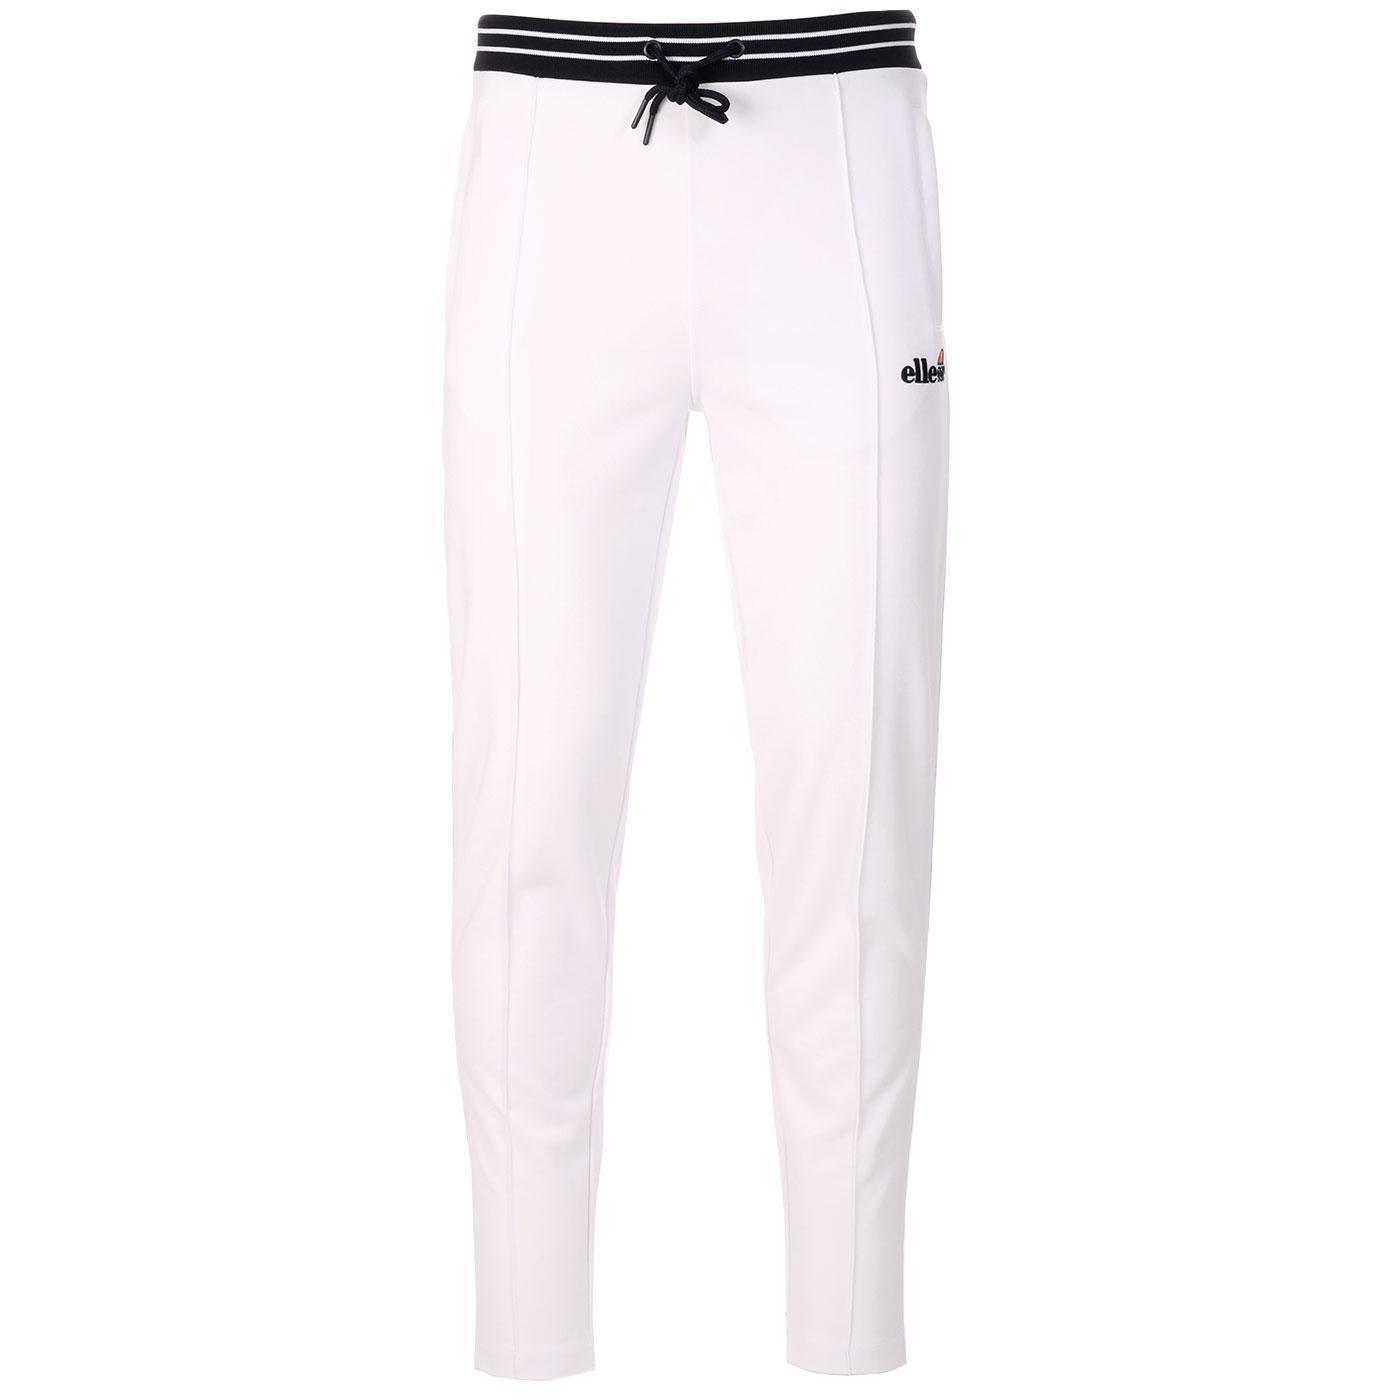 Zian ELLESSE Retro Stripe Waistband Track Pants W